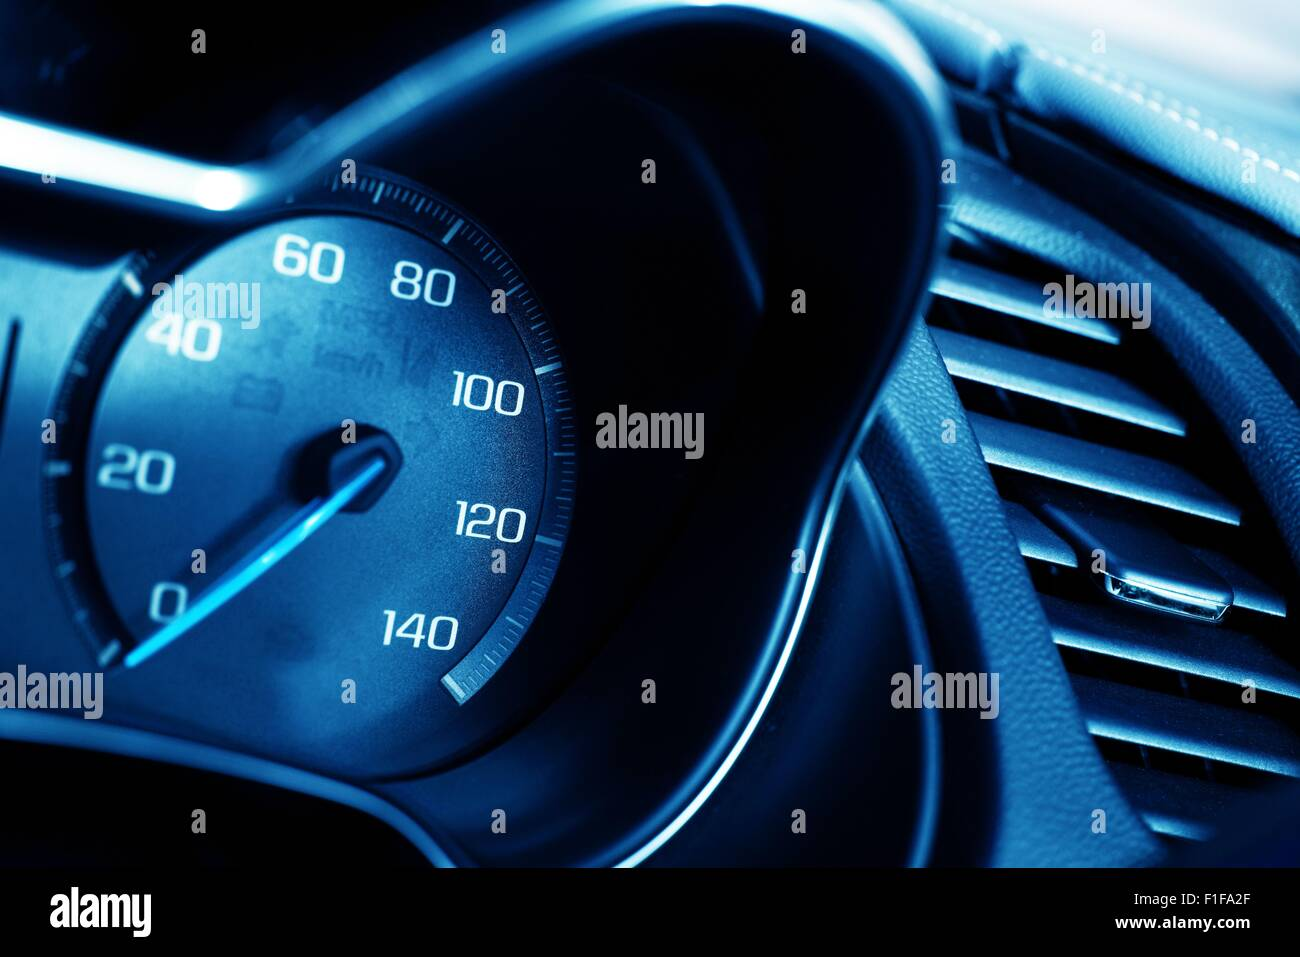 Blaue Tacho Nahaufnahme. Auto Armaturenbrett Tacho Stockbild